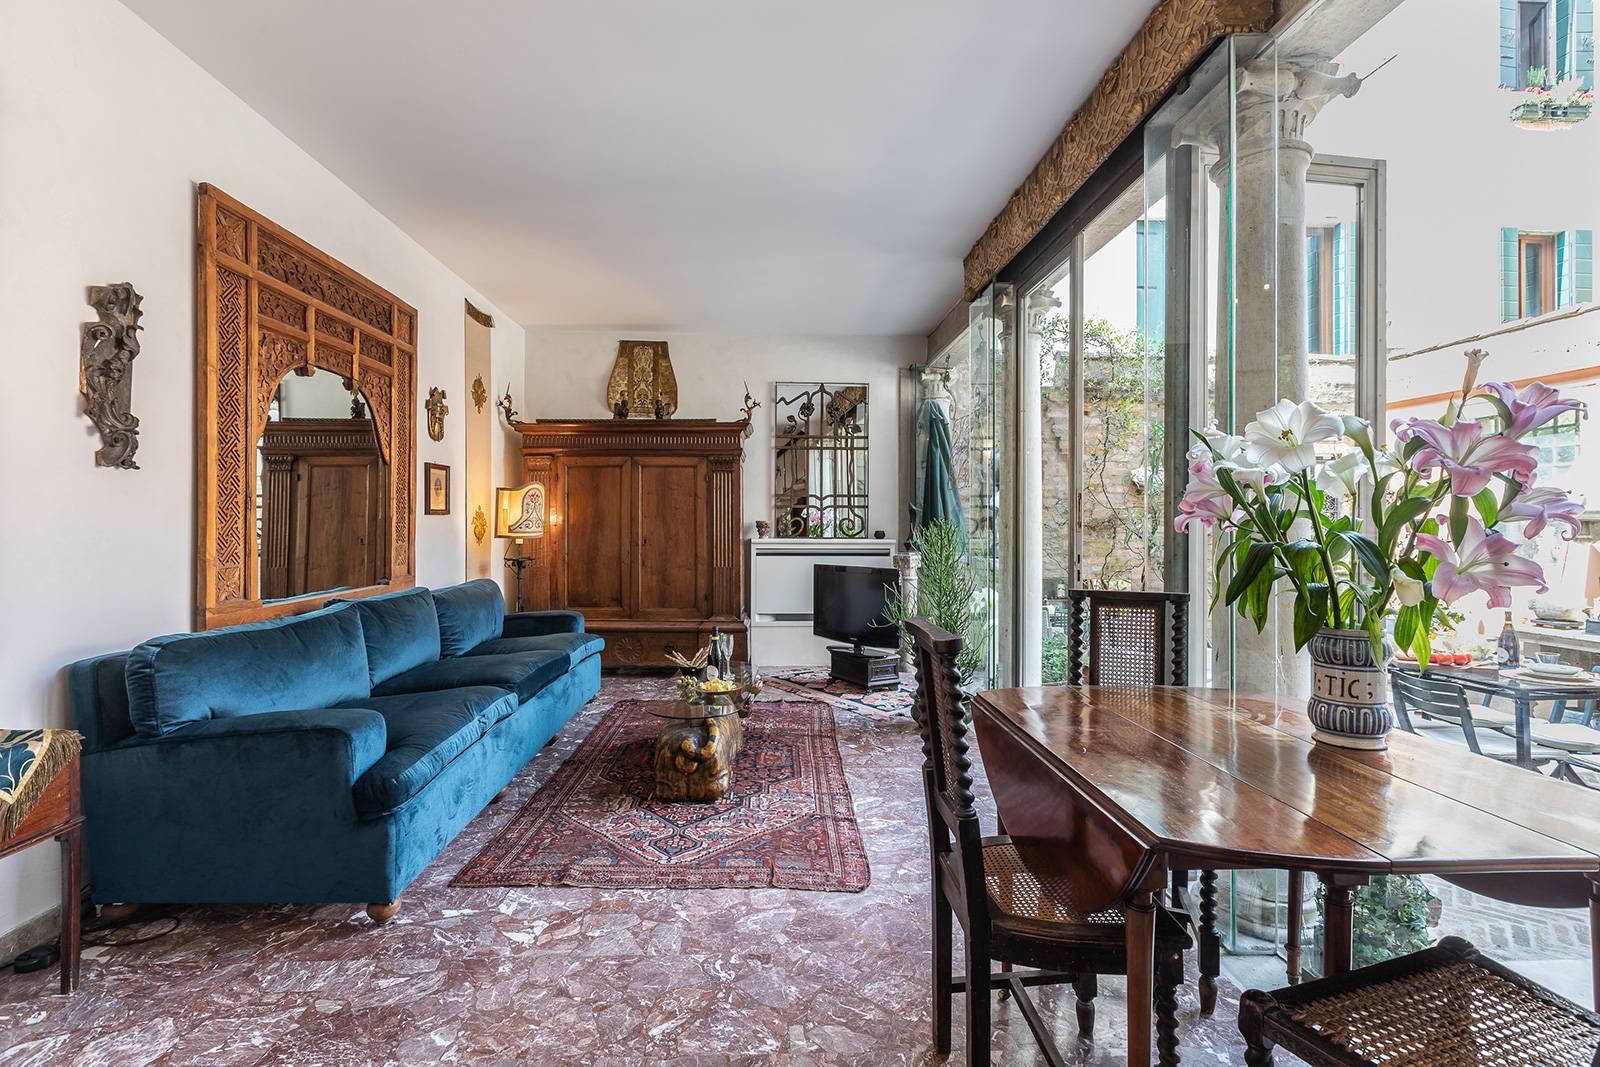 the Loredan is a unique Venetian style home